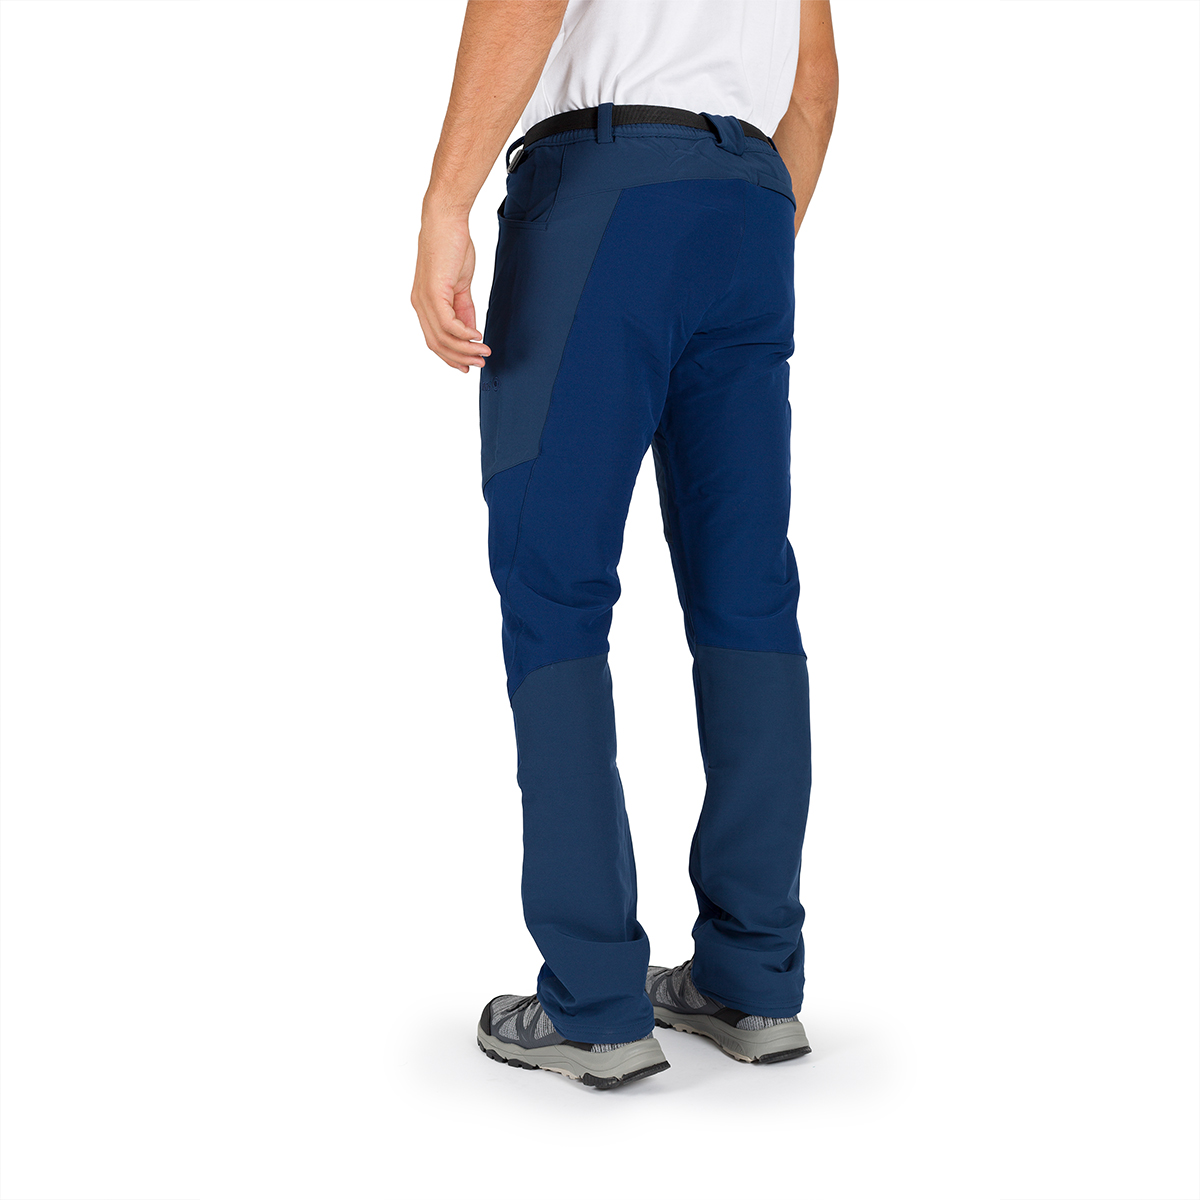 MAN'S CAPRI STRETCH PANT BLUE